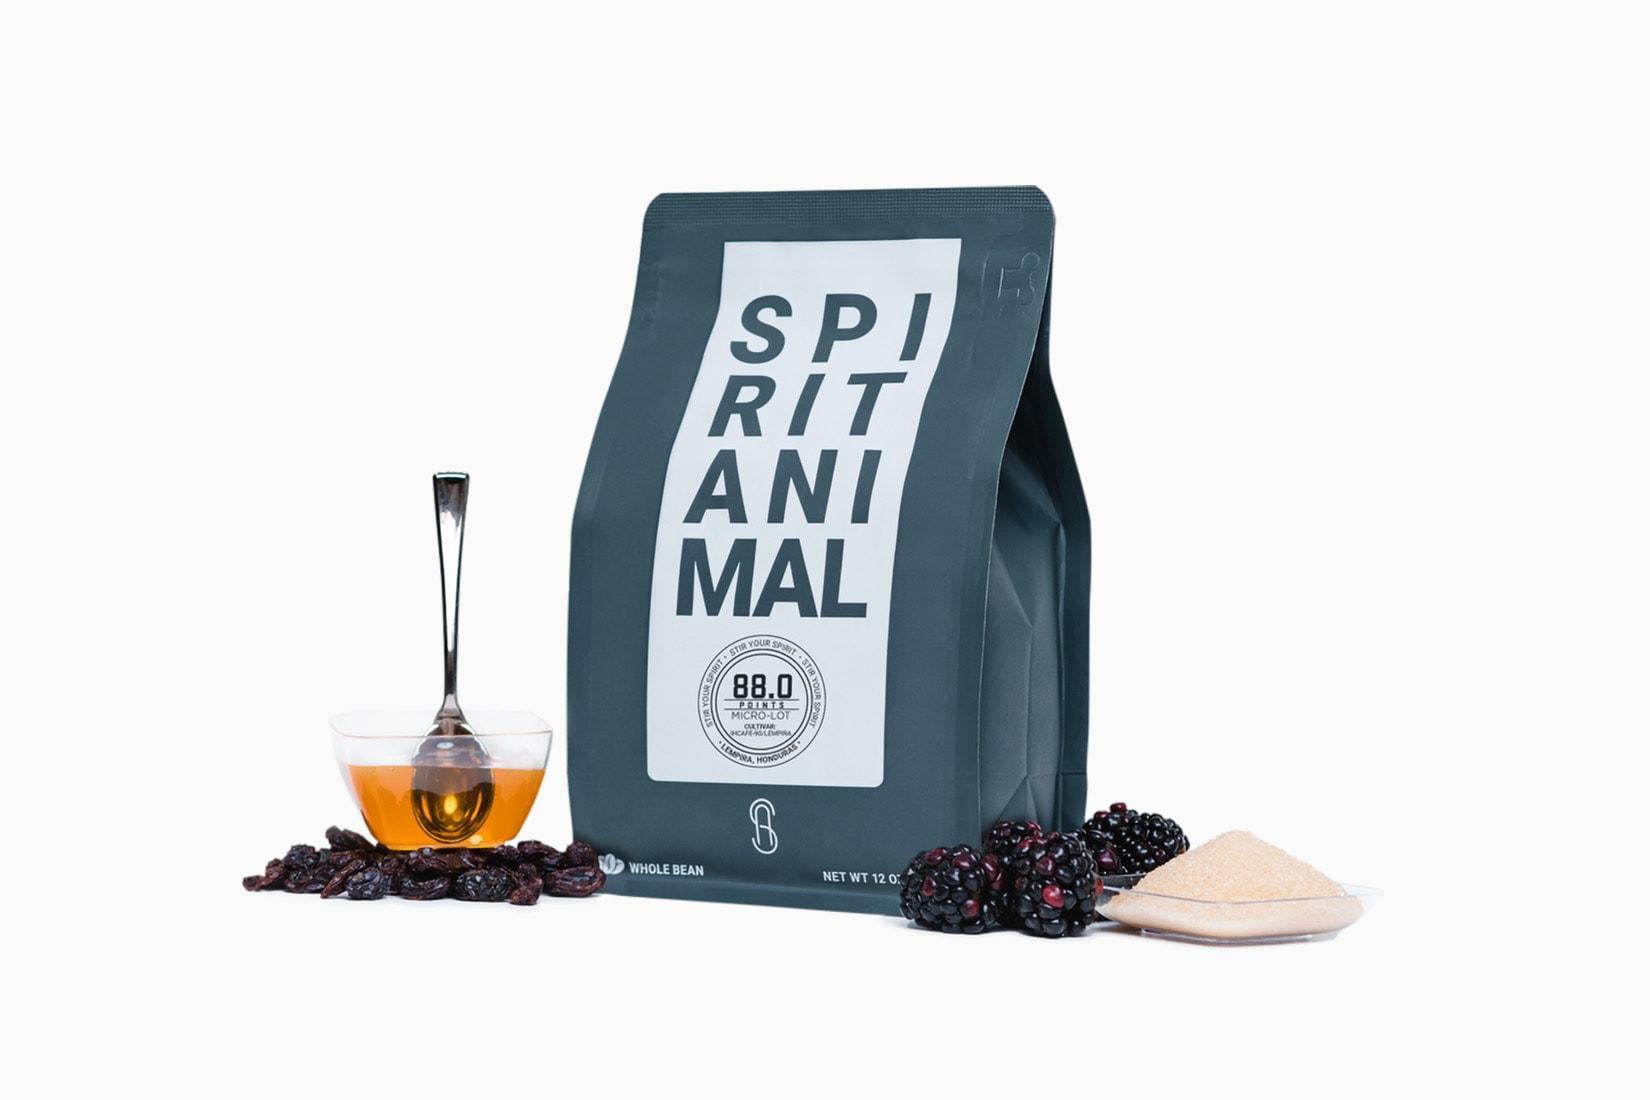 best coffee beans brands organic spirit animal review - Luxe Digital